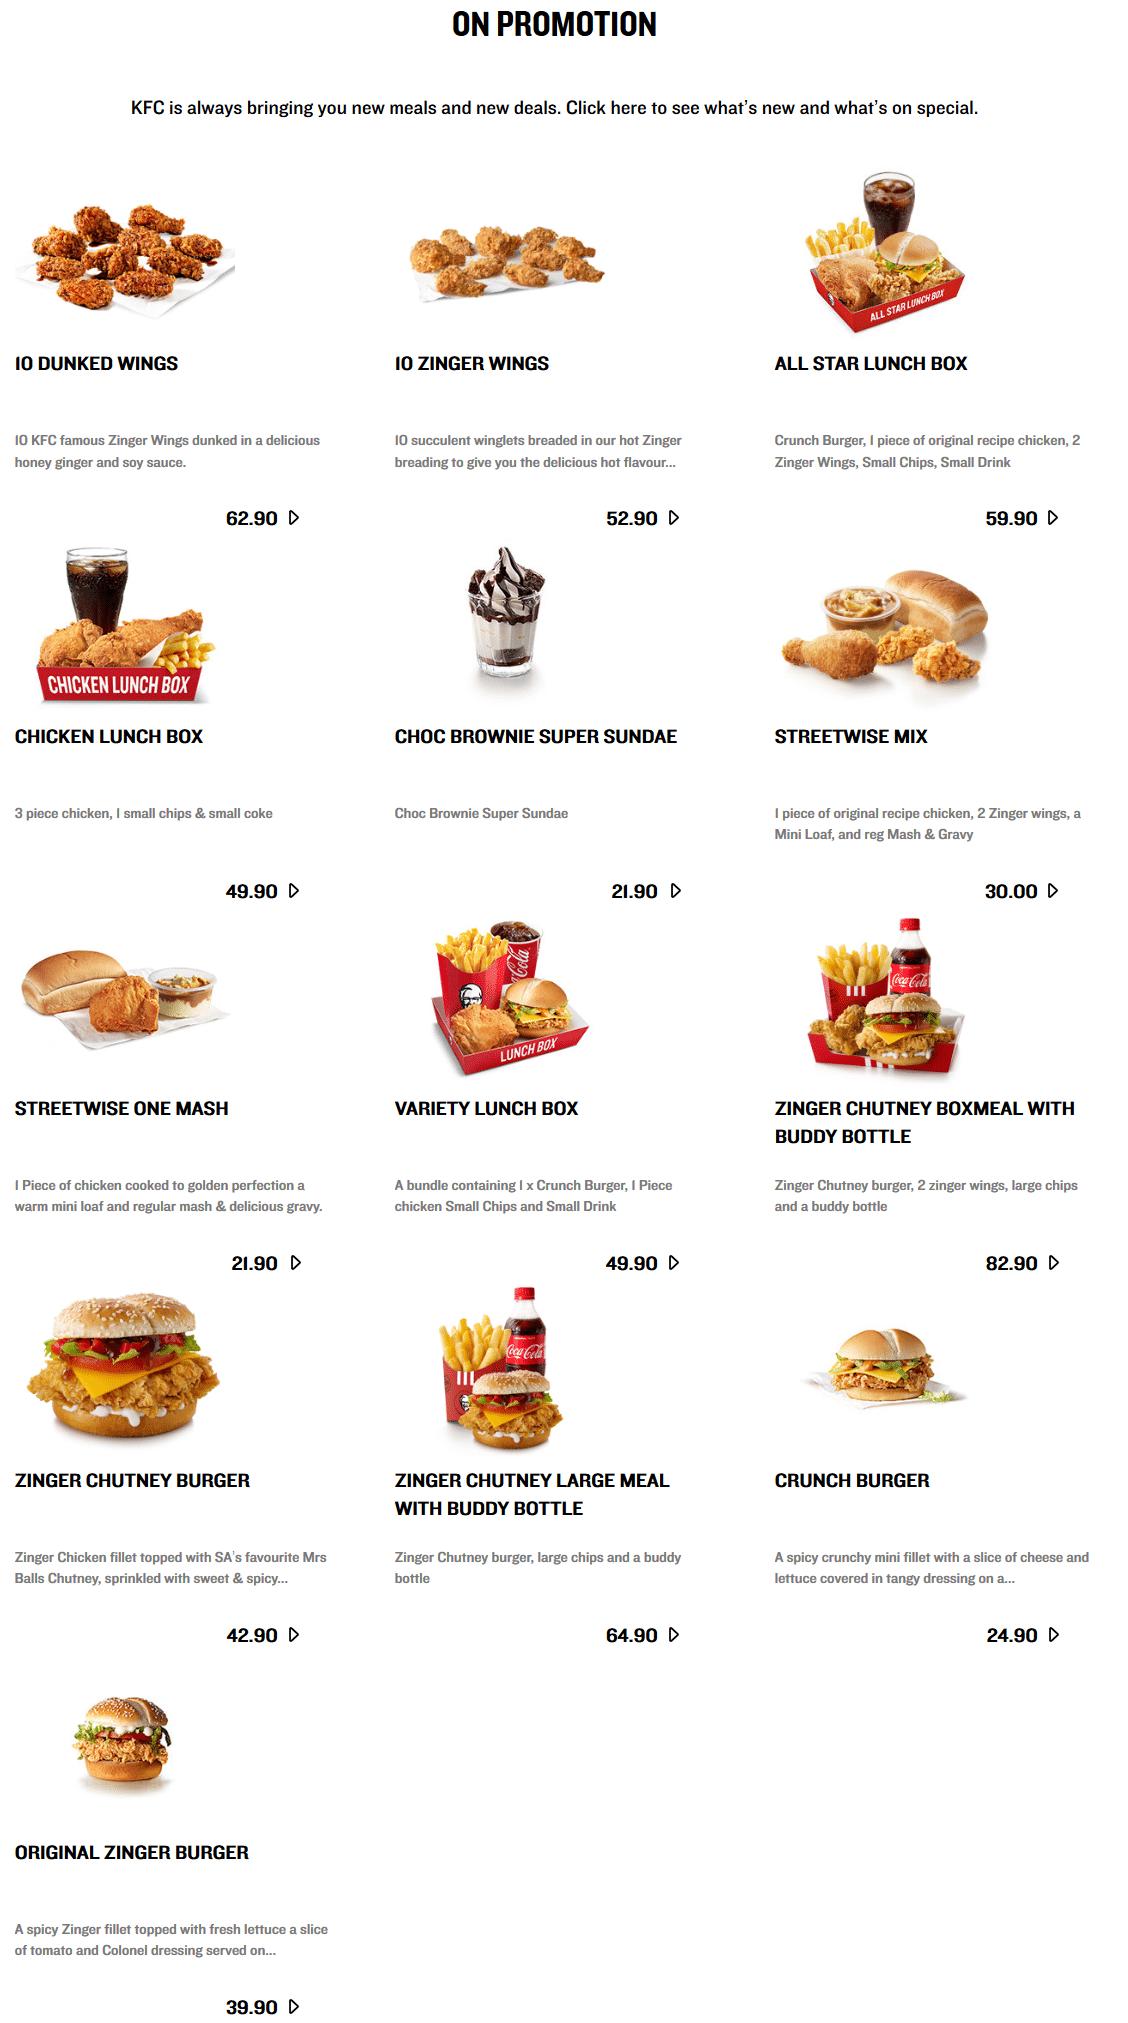 Bucket Kentucky Fried Chicken Menu Prices In 2020 Kentucky Fried Chicken Menu Kentucky Fried Fried Chicken